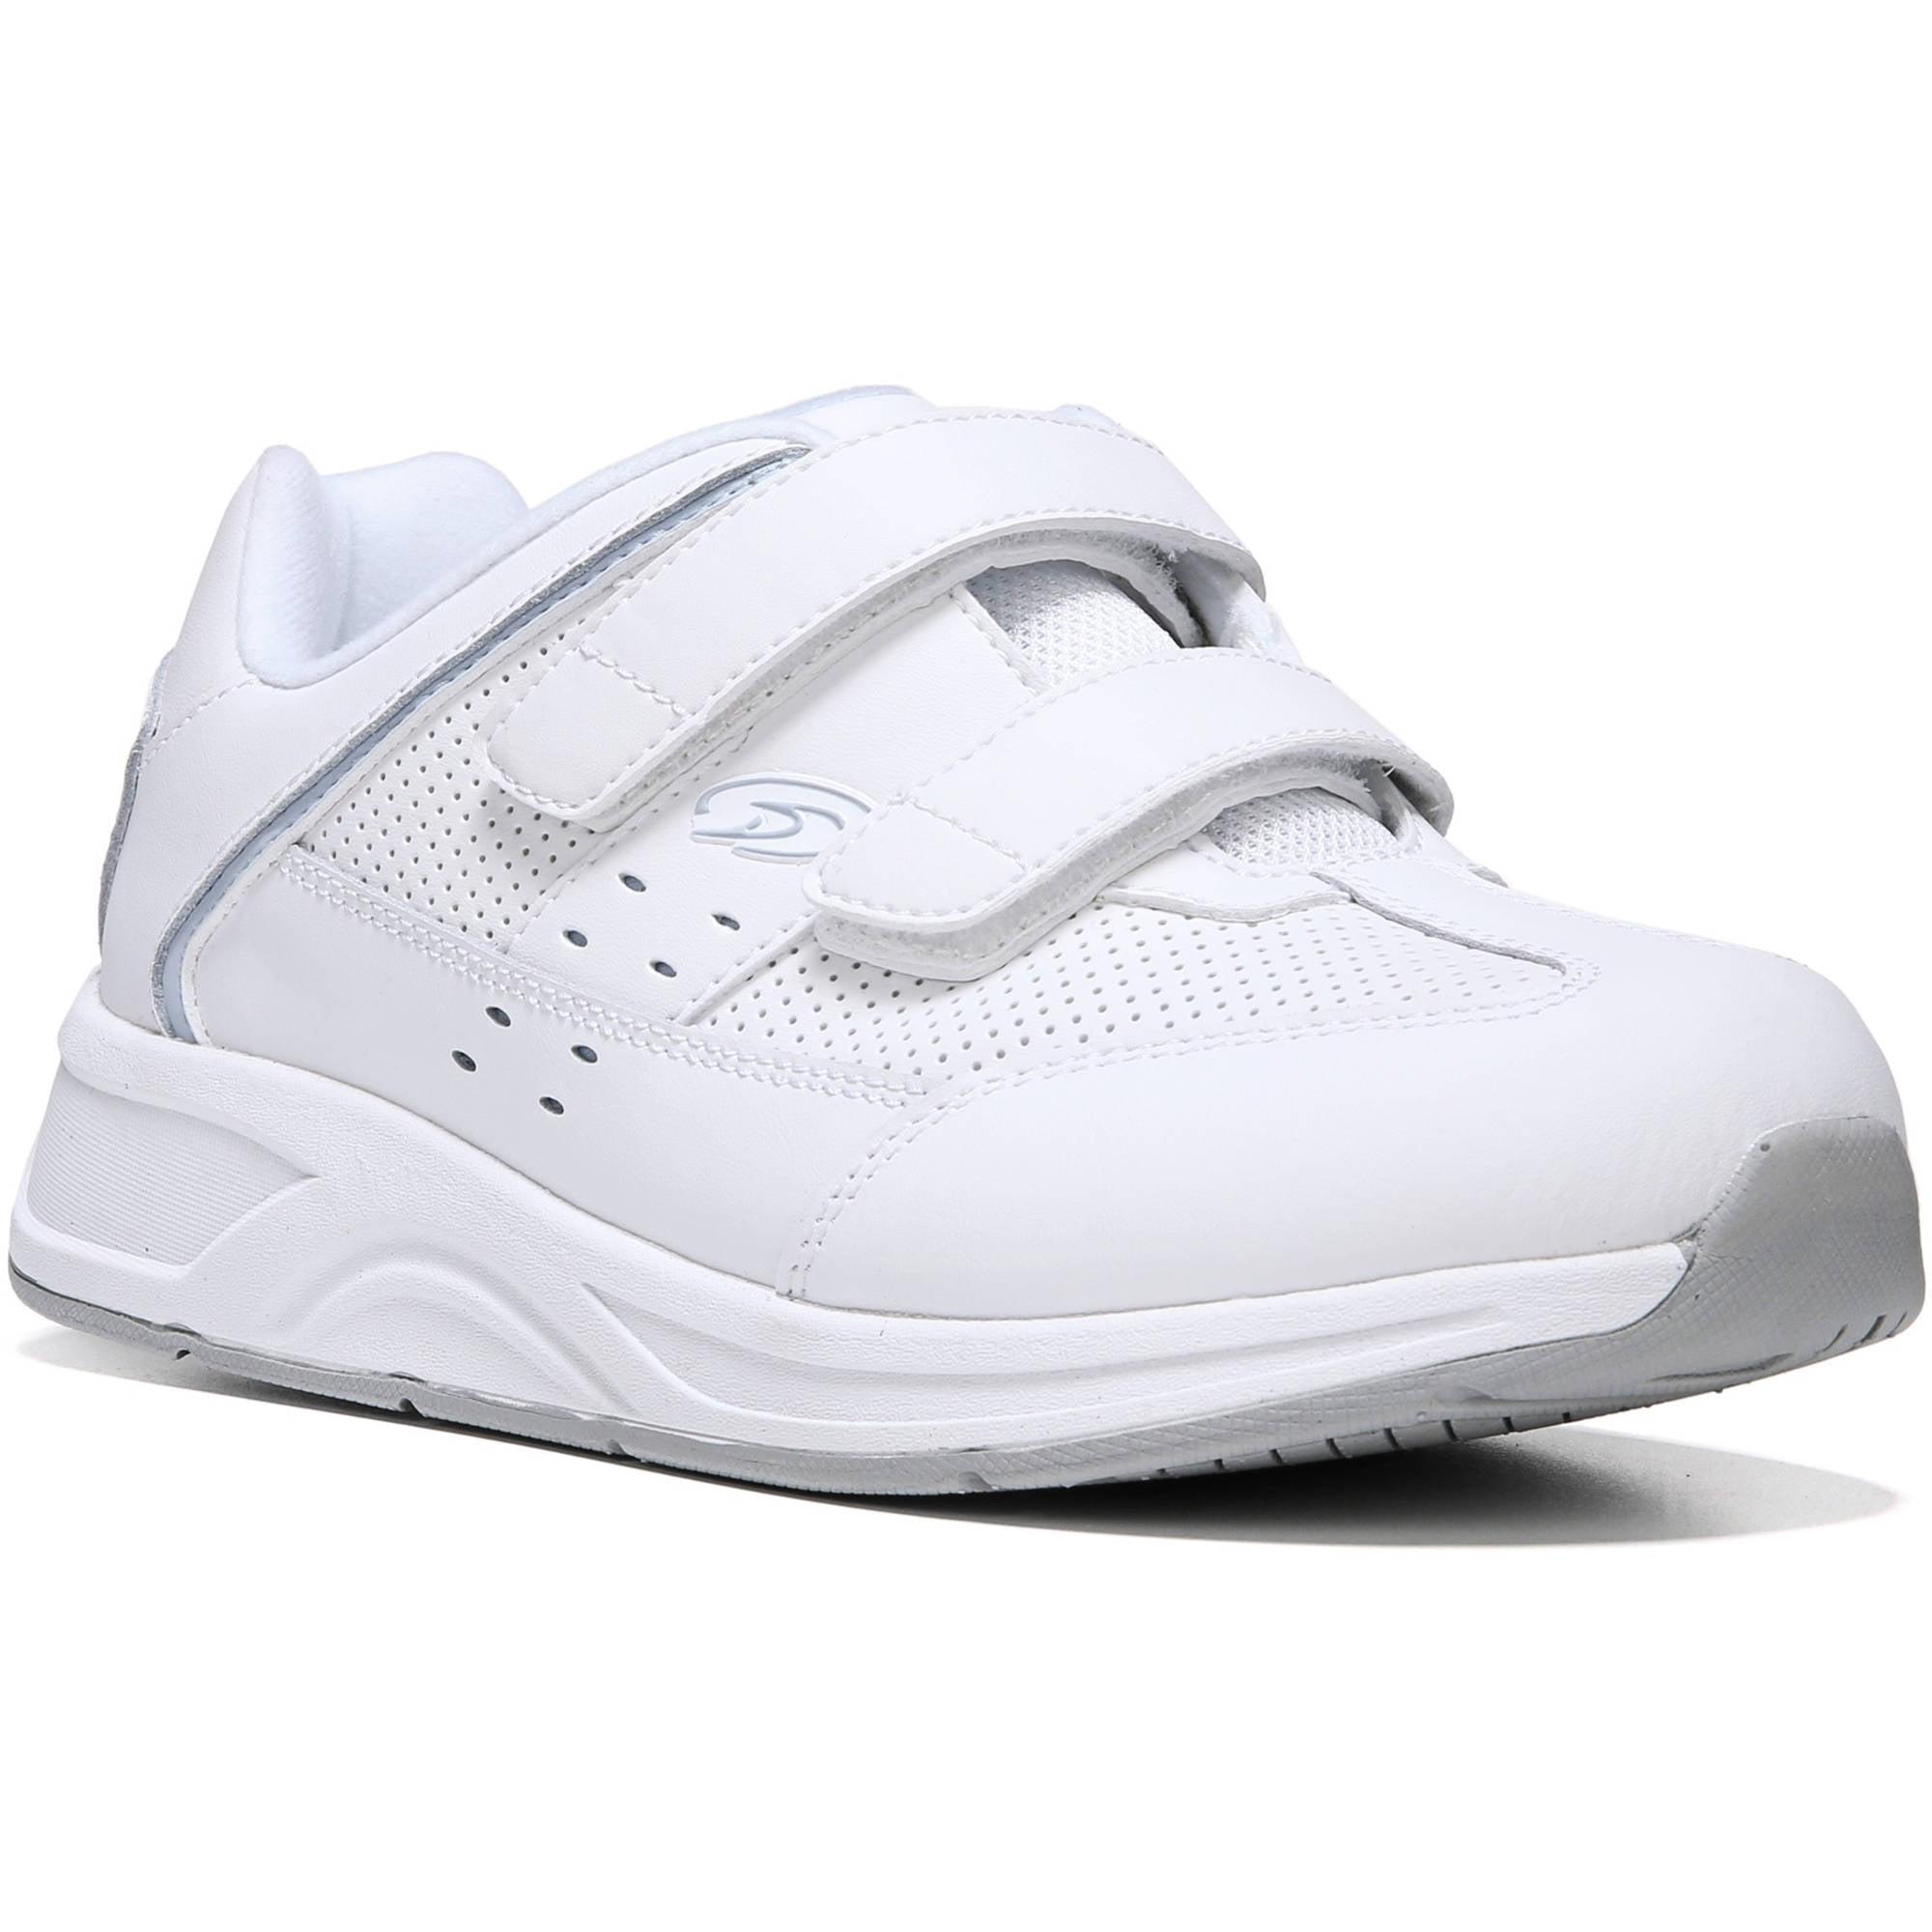 Dr. Scholls Women's Kellie Therapeutic Athletic Shoe, Wide Width